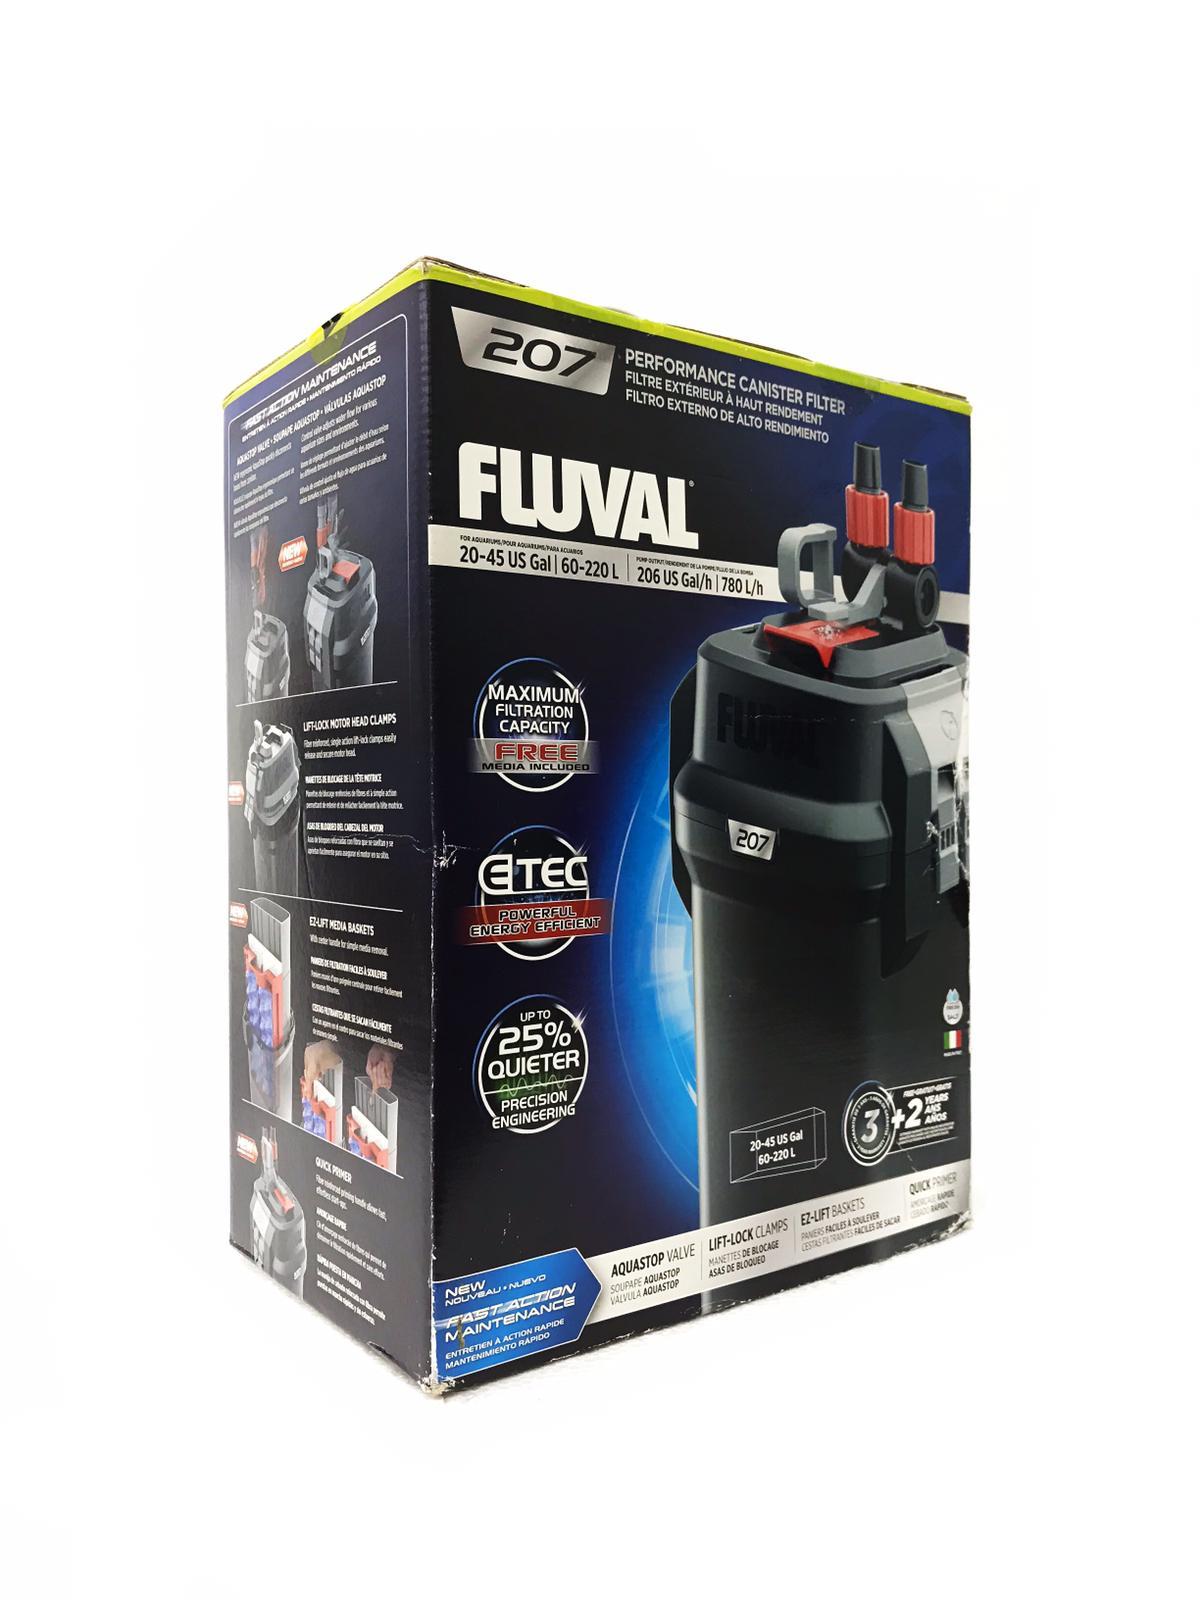 Fluval Canister Filter 07 Series